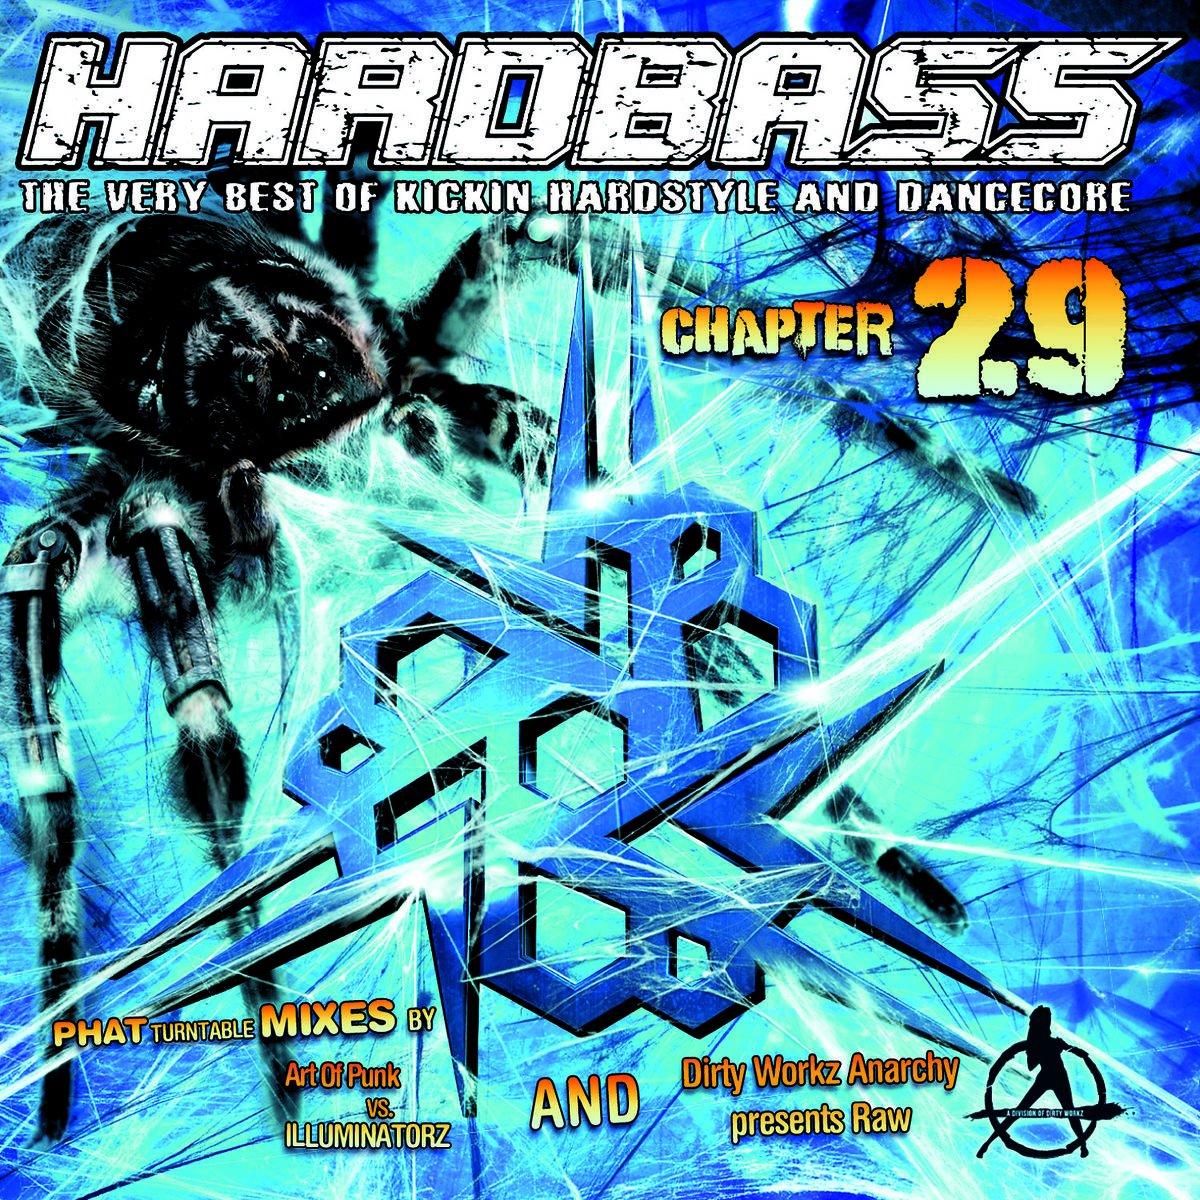 VA - Hardbass Chapter 29-2CD-2015-SRG Download